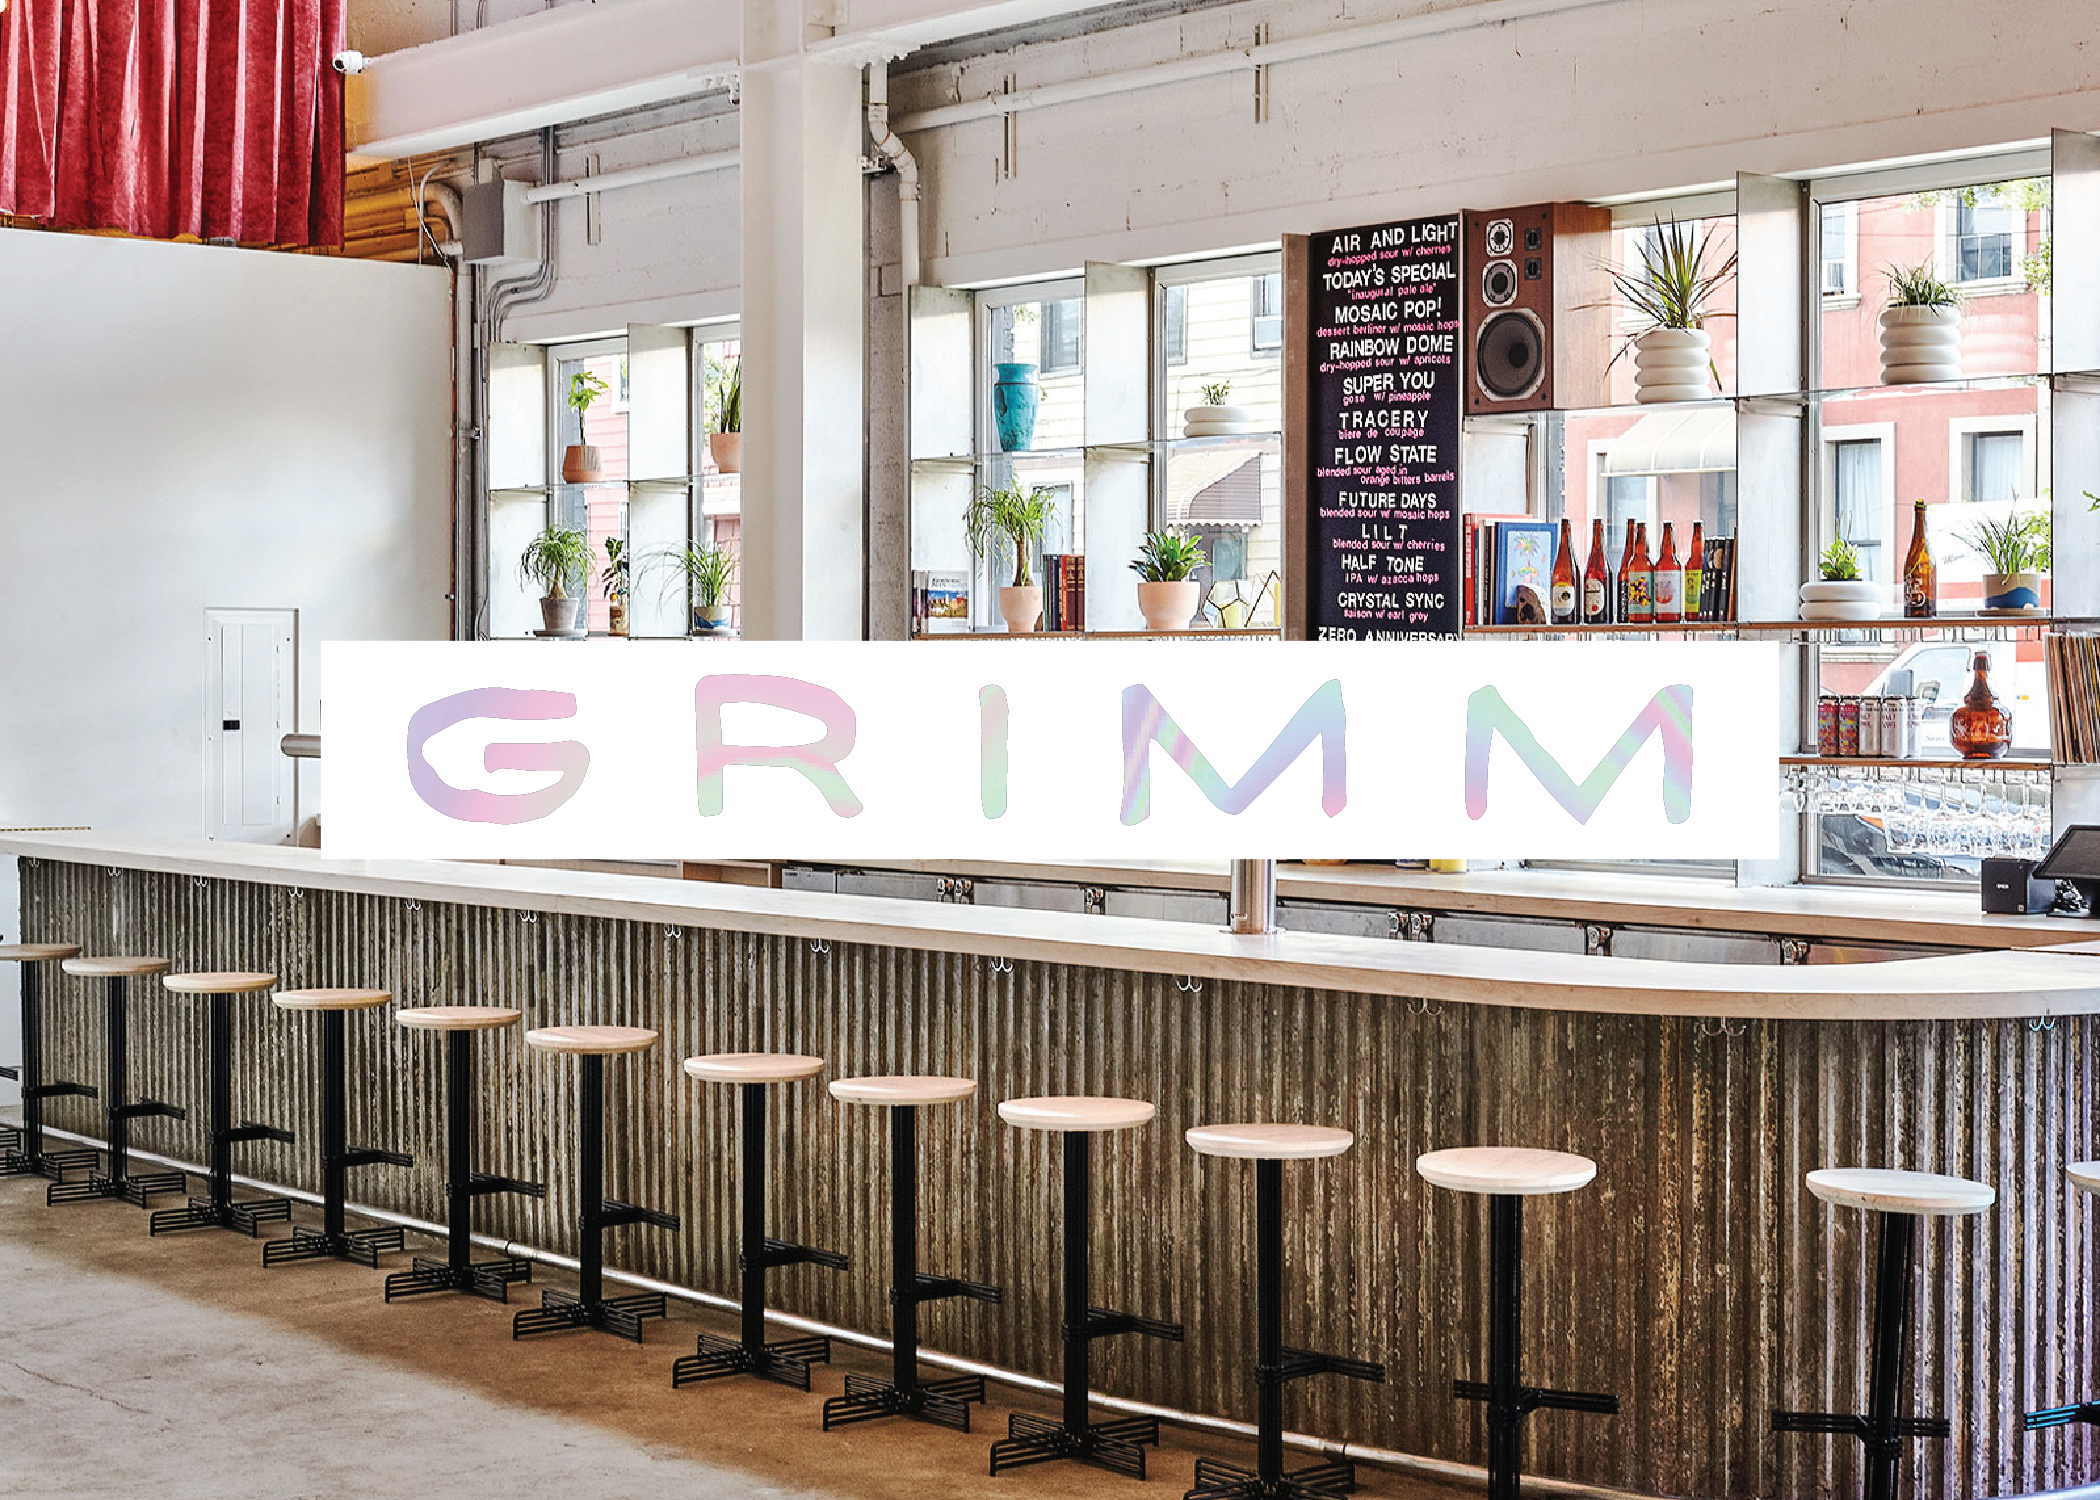 Grimm Artisanal Ales - 990 Metropolitan Ave, Brooklyn, NY 11211